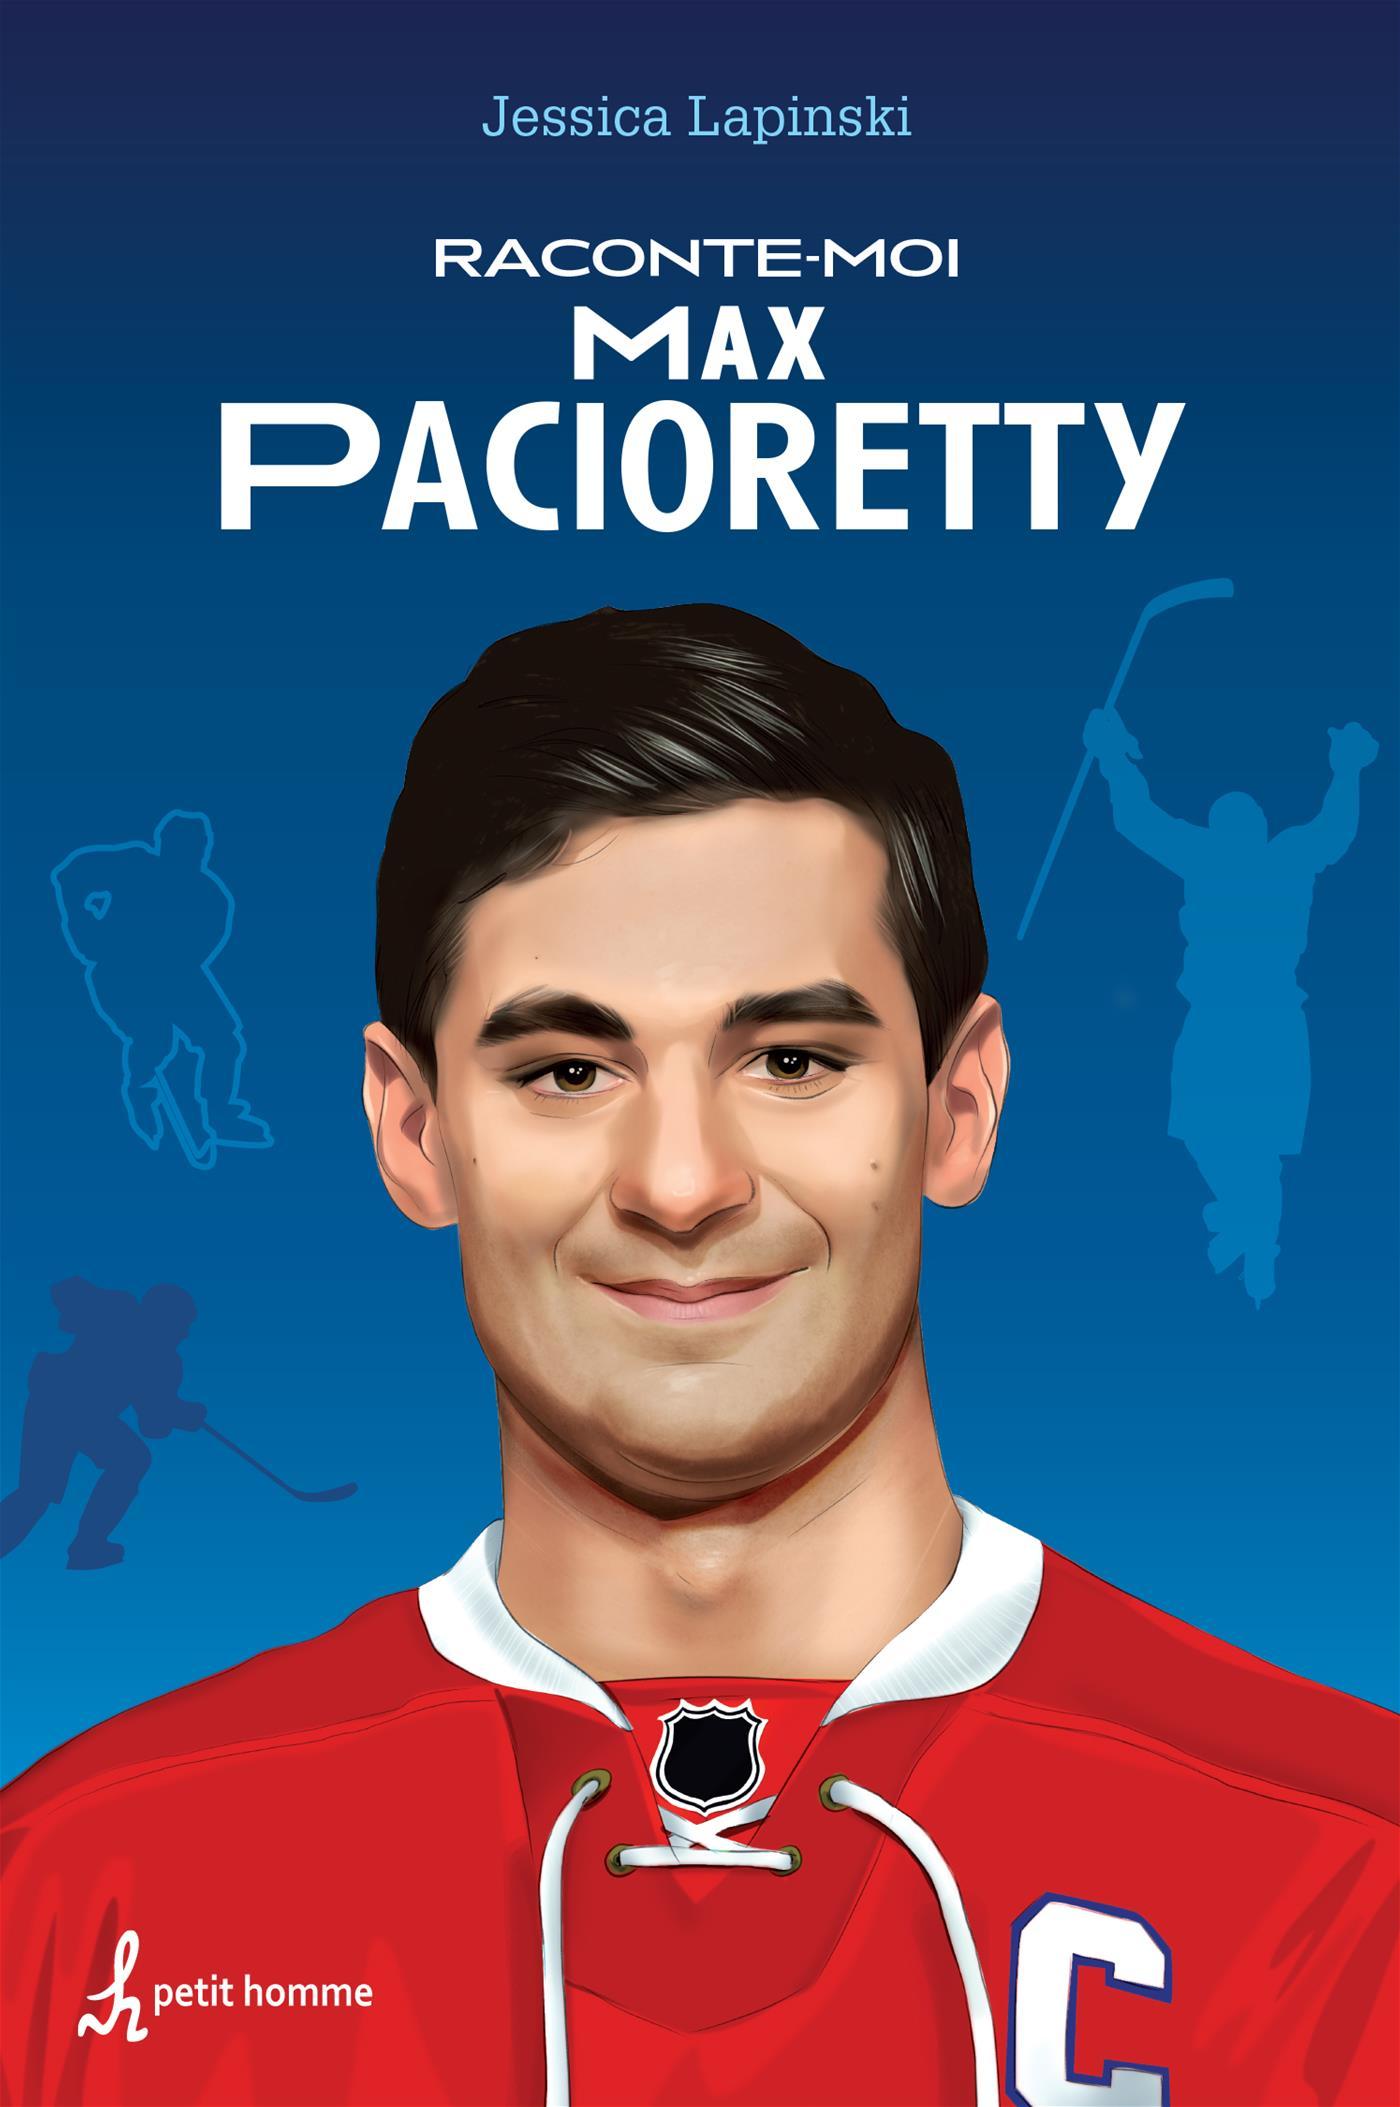 Raconte-moi Max Pacioretty